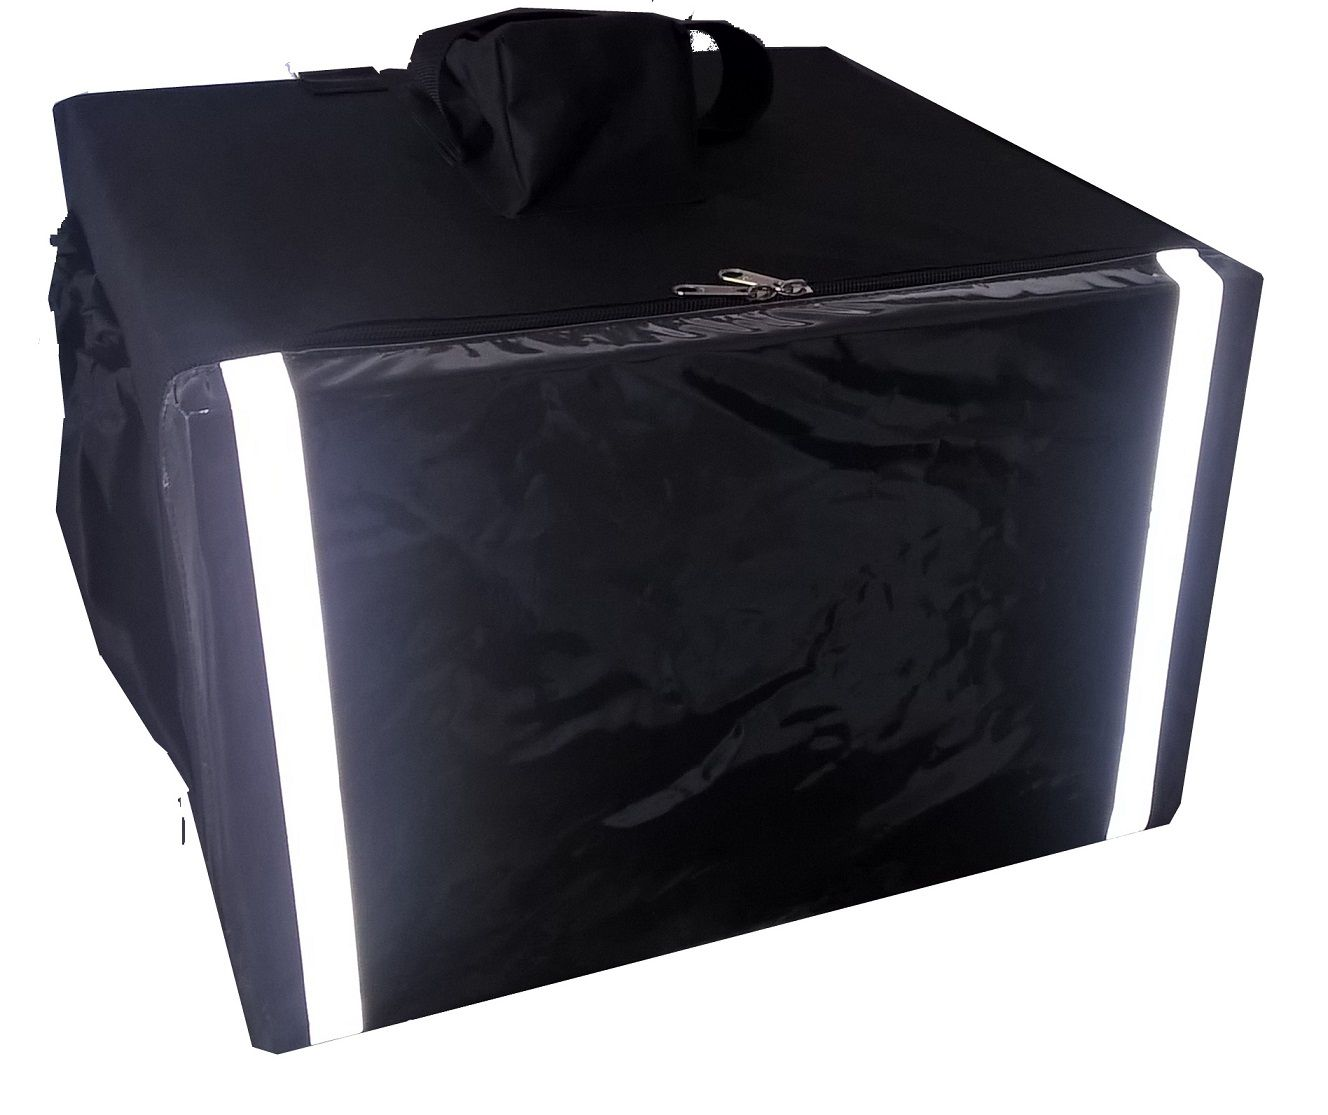 Bolsa Mochila Para Entrega De Pizza Térmica Motoboy Com Caixa de Isopor 35cm 40cm 44cm 50cm 53cm  - lisandro do amaral